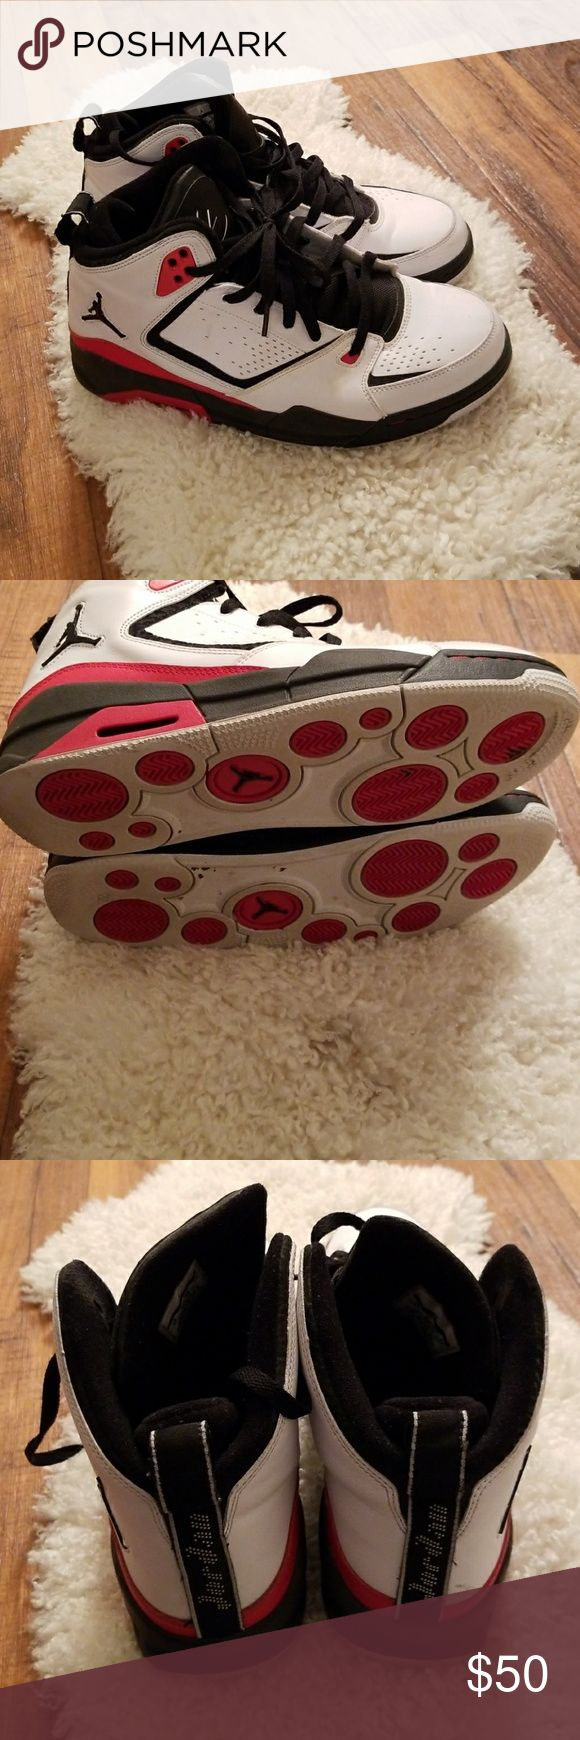 Men's Jordans Flight Jordans. White with red and black trim Jordan Shoes Sneakers